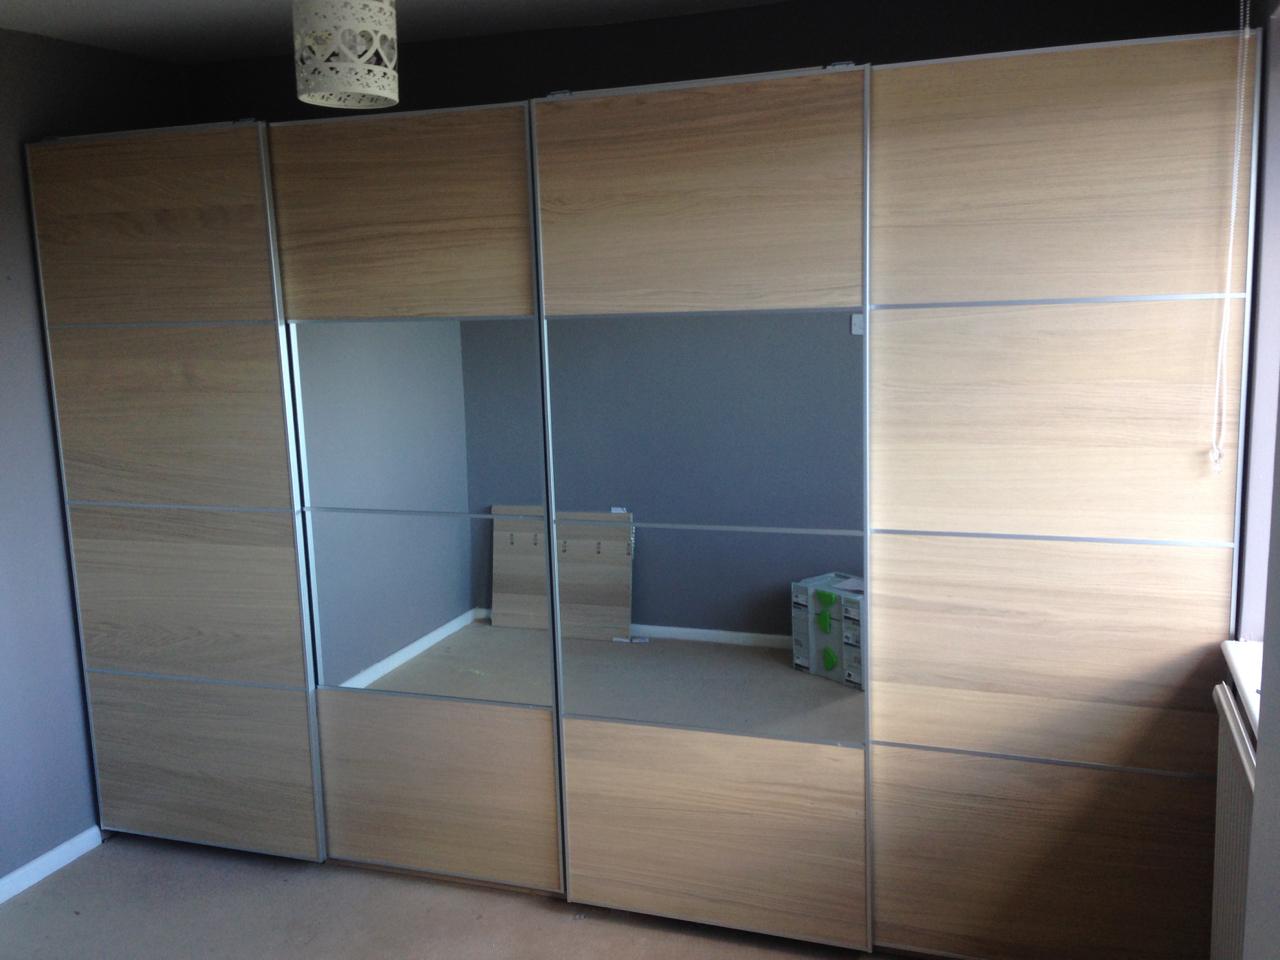 Ikea PAX sliding oak and mirrored wardrobes assembled by www.norwichflatpack.co.uk